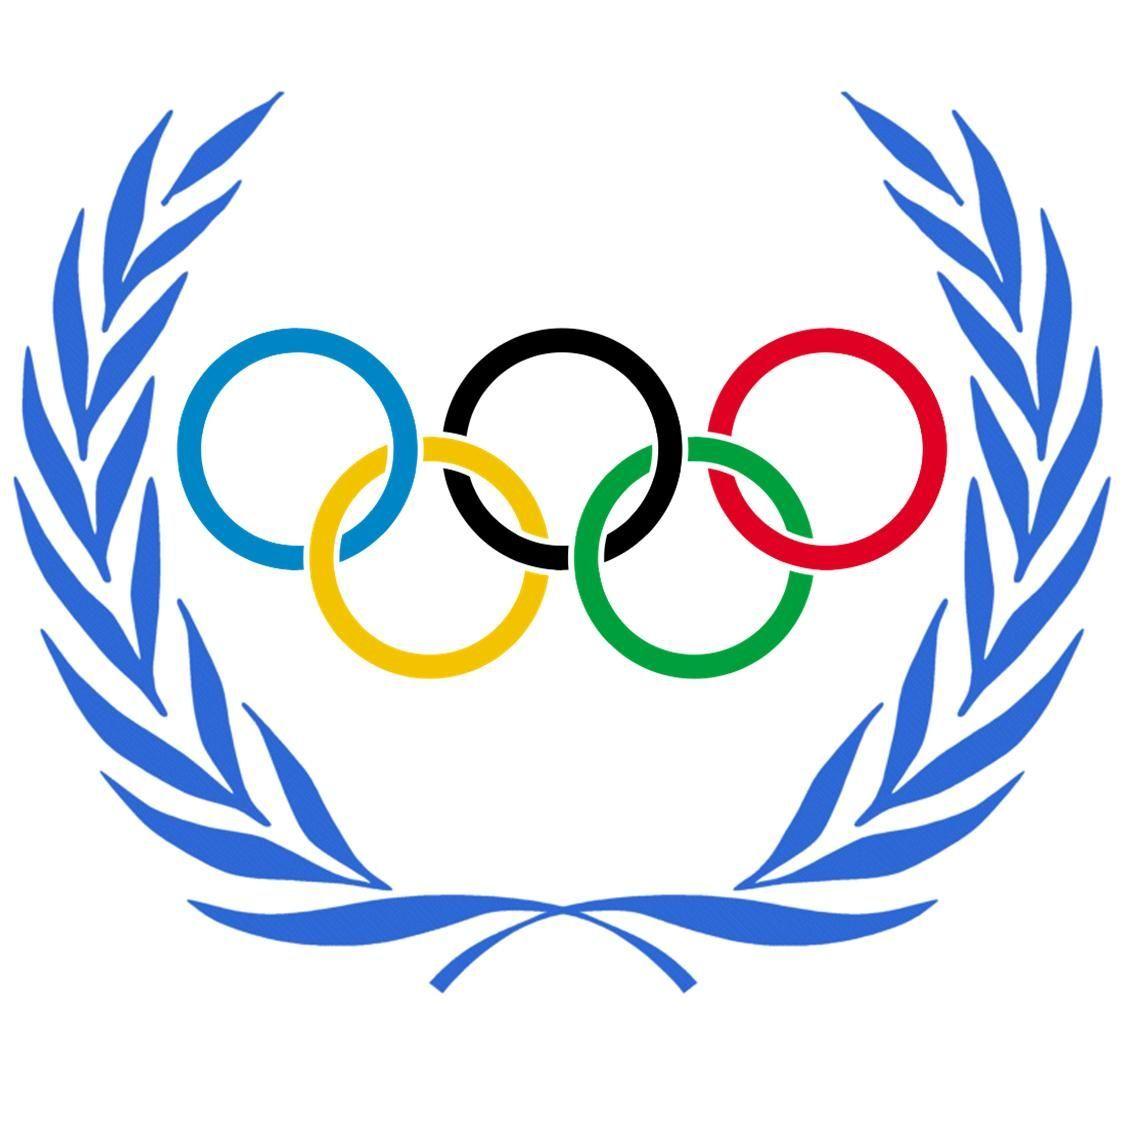 Olympic Opening Ceremonies